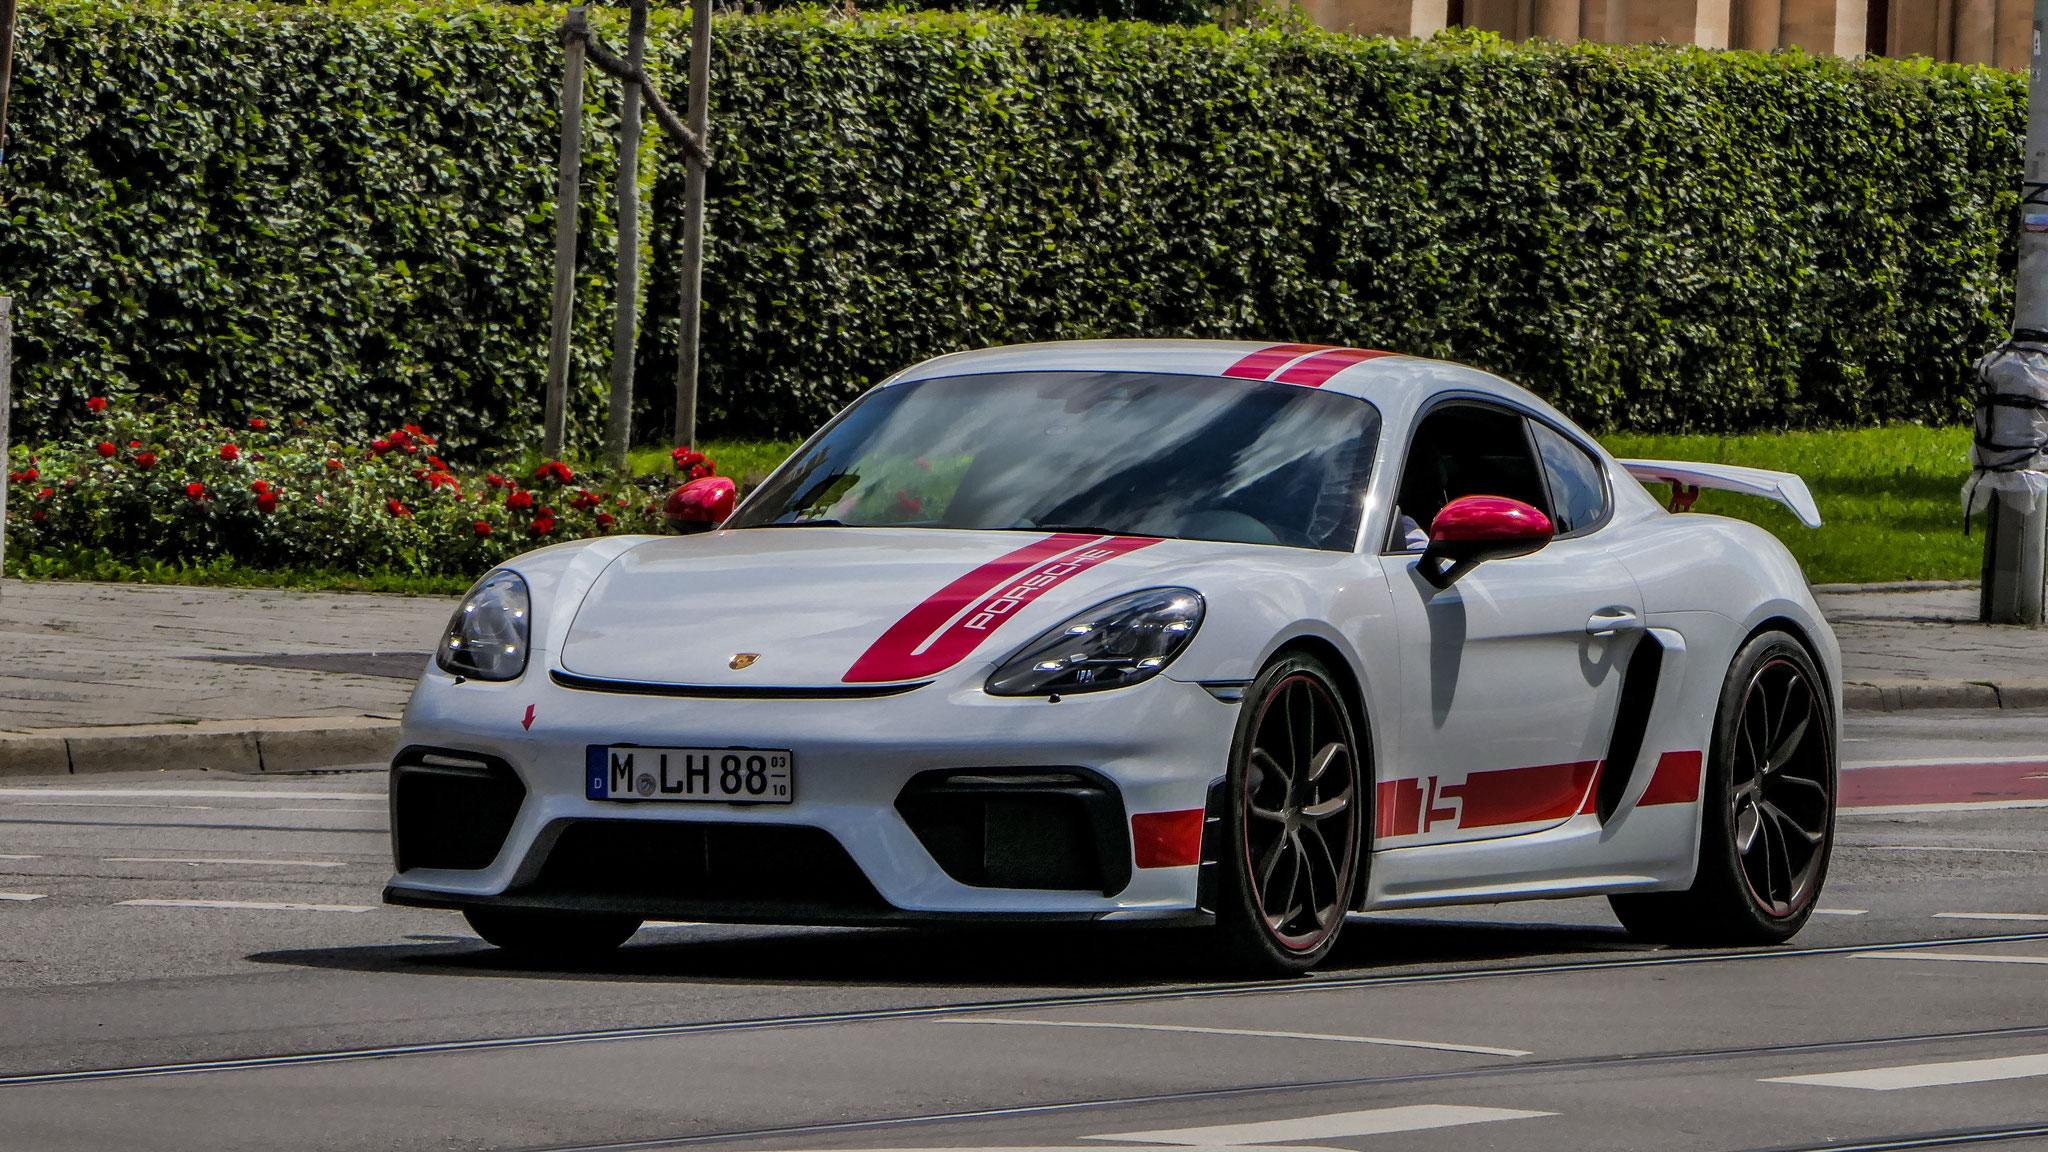 Porsche Cayman GT4 Sports Cup Edition - M-LH-88